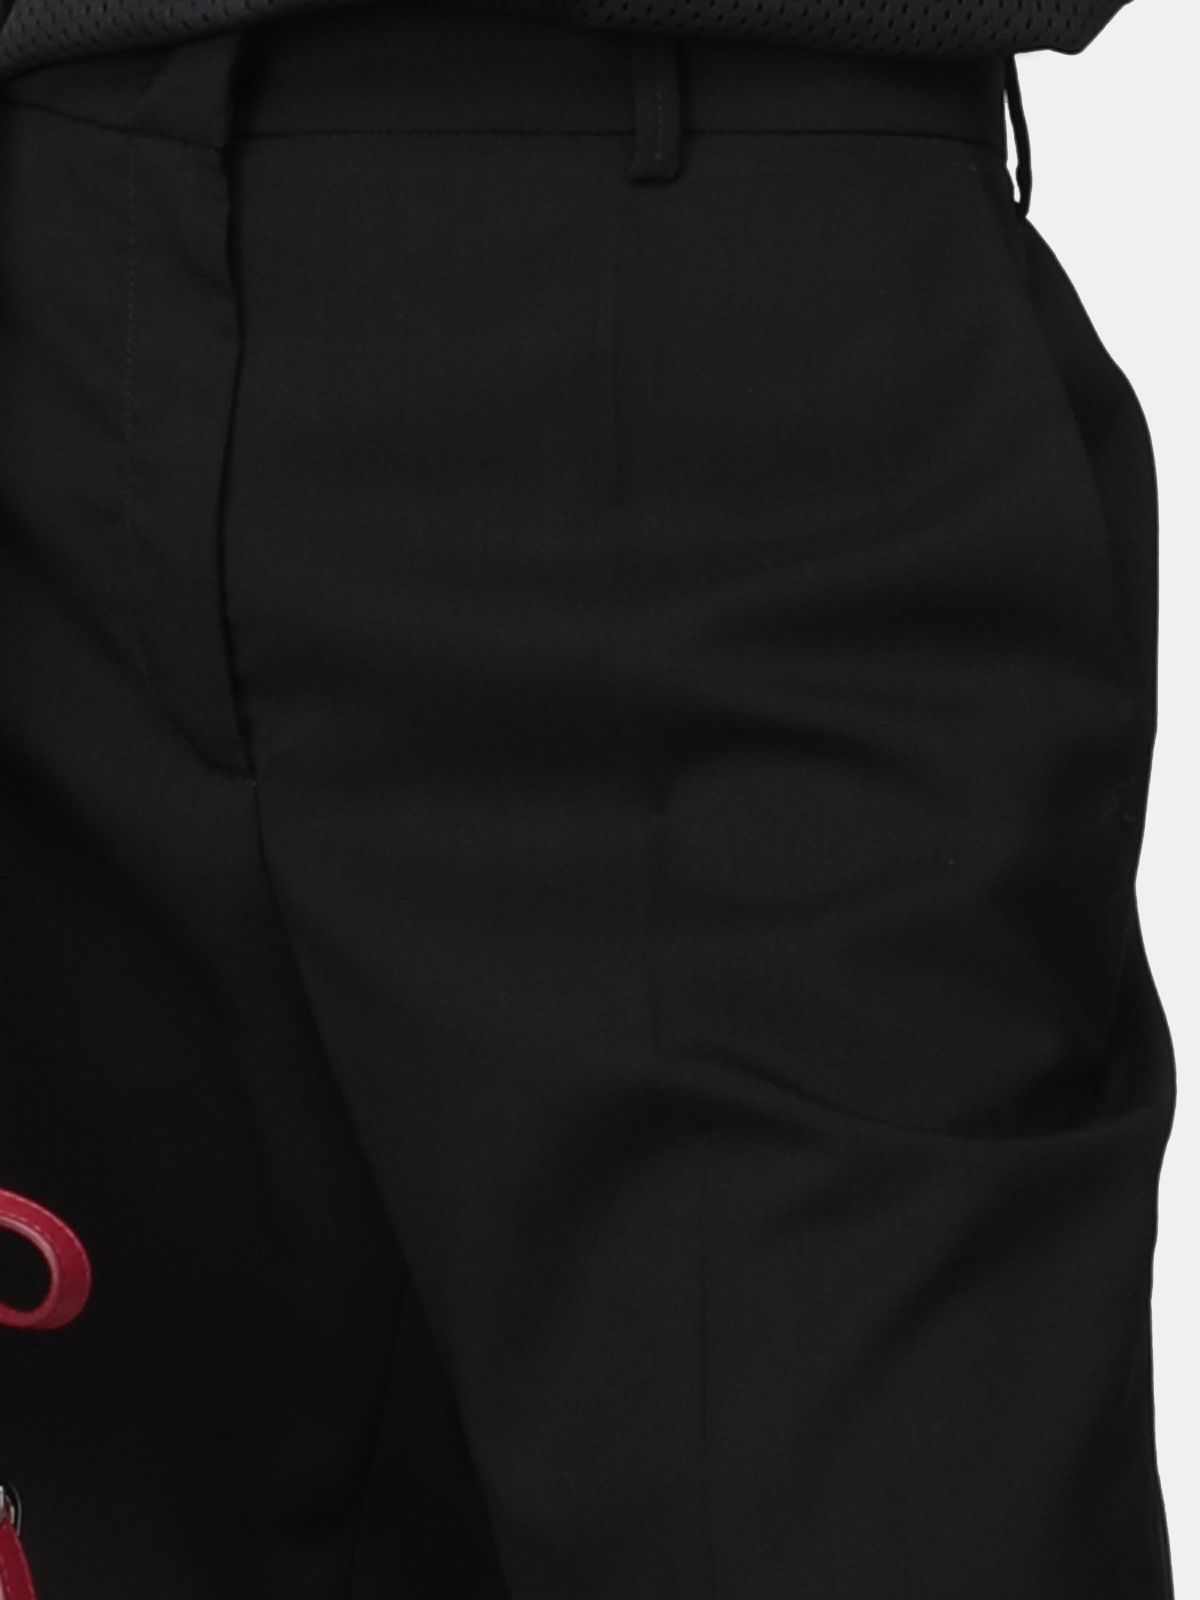 Golden Goose - Abigail black high-waist trousers in